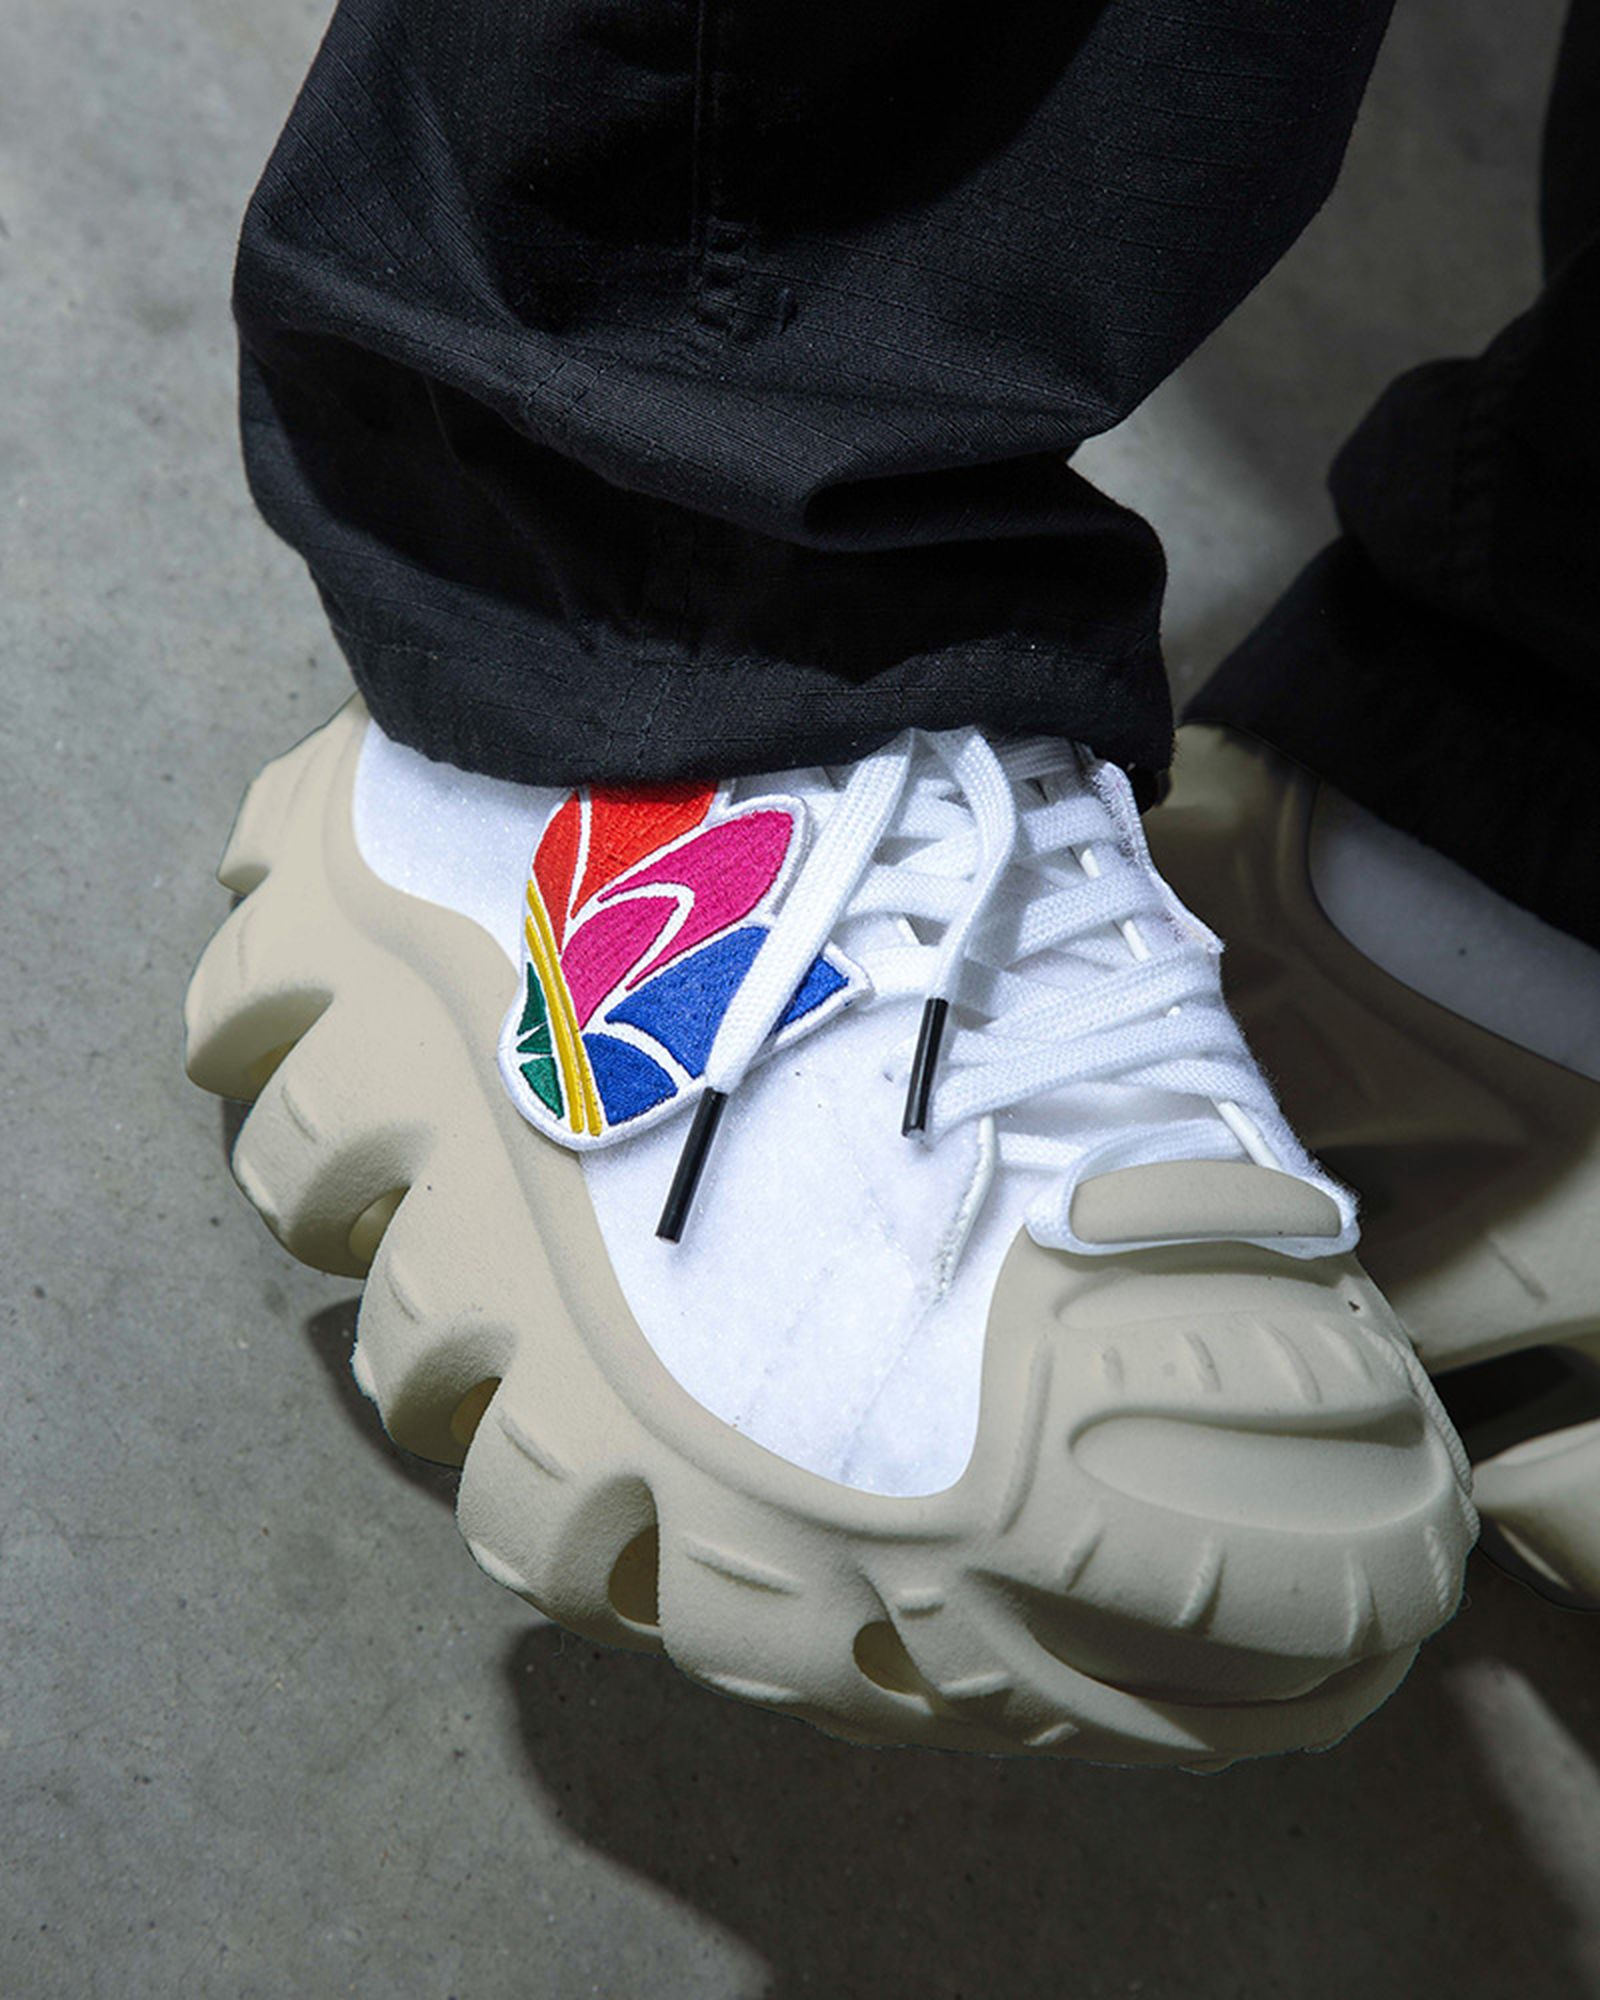 mr-bailey-ammonite-adidas-superstar-03